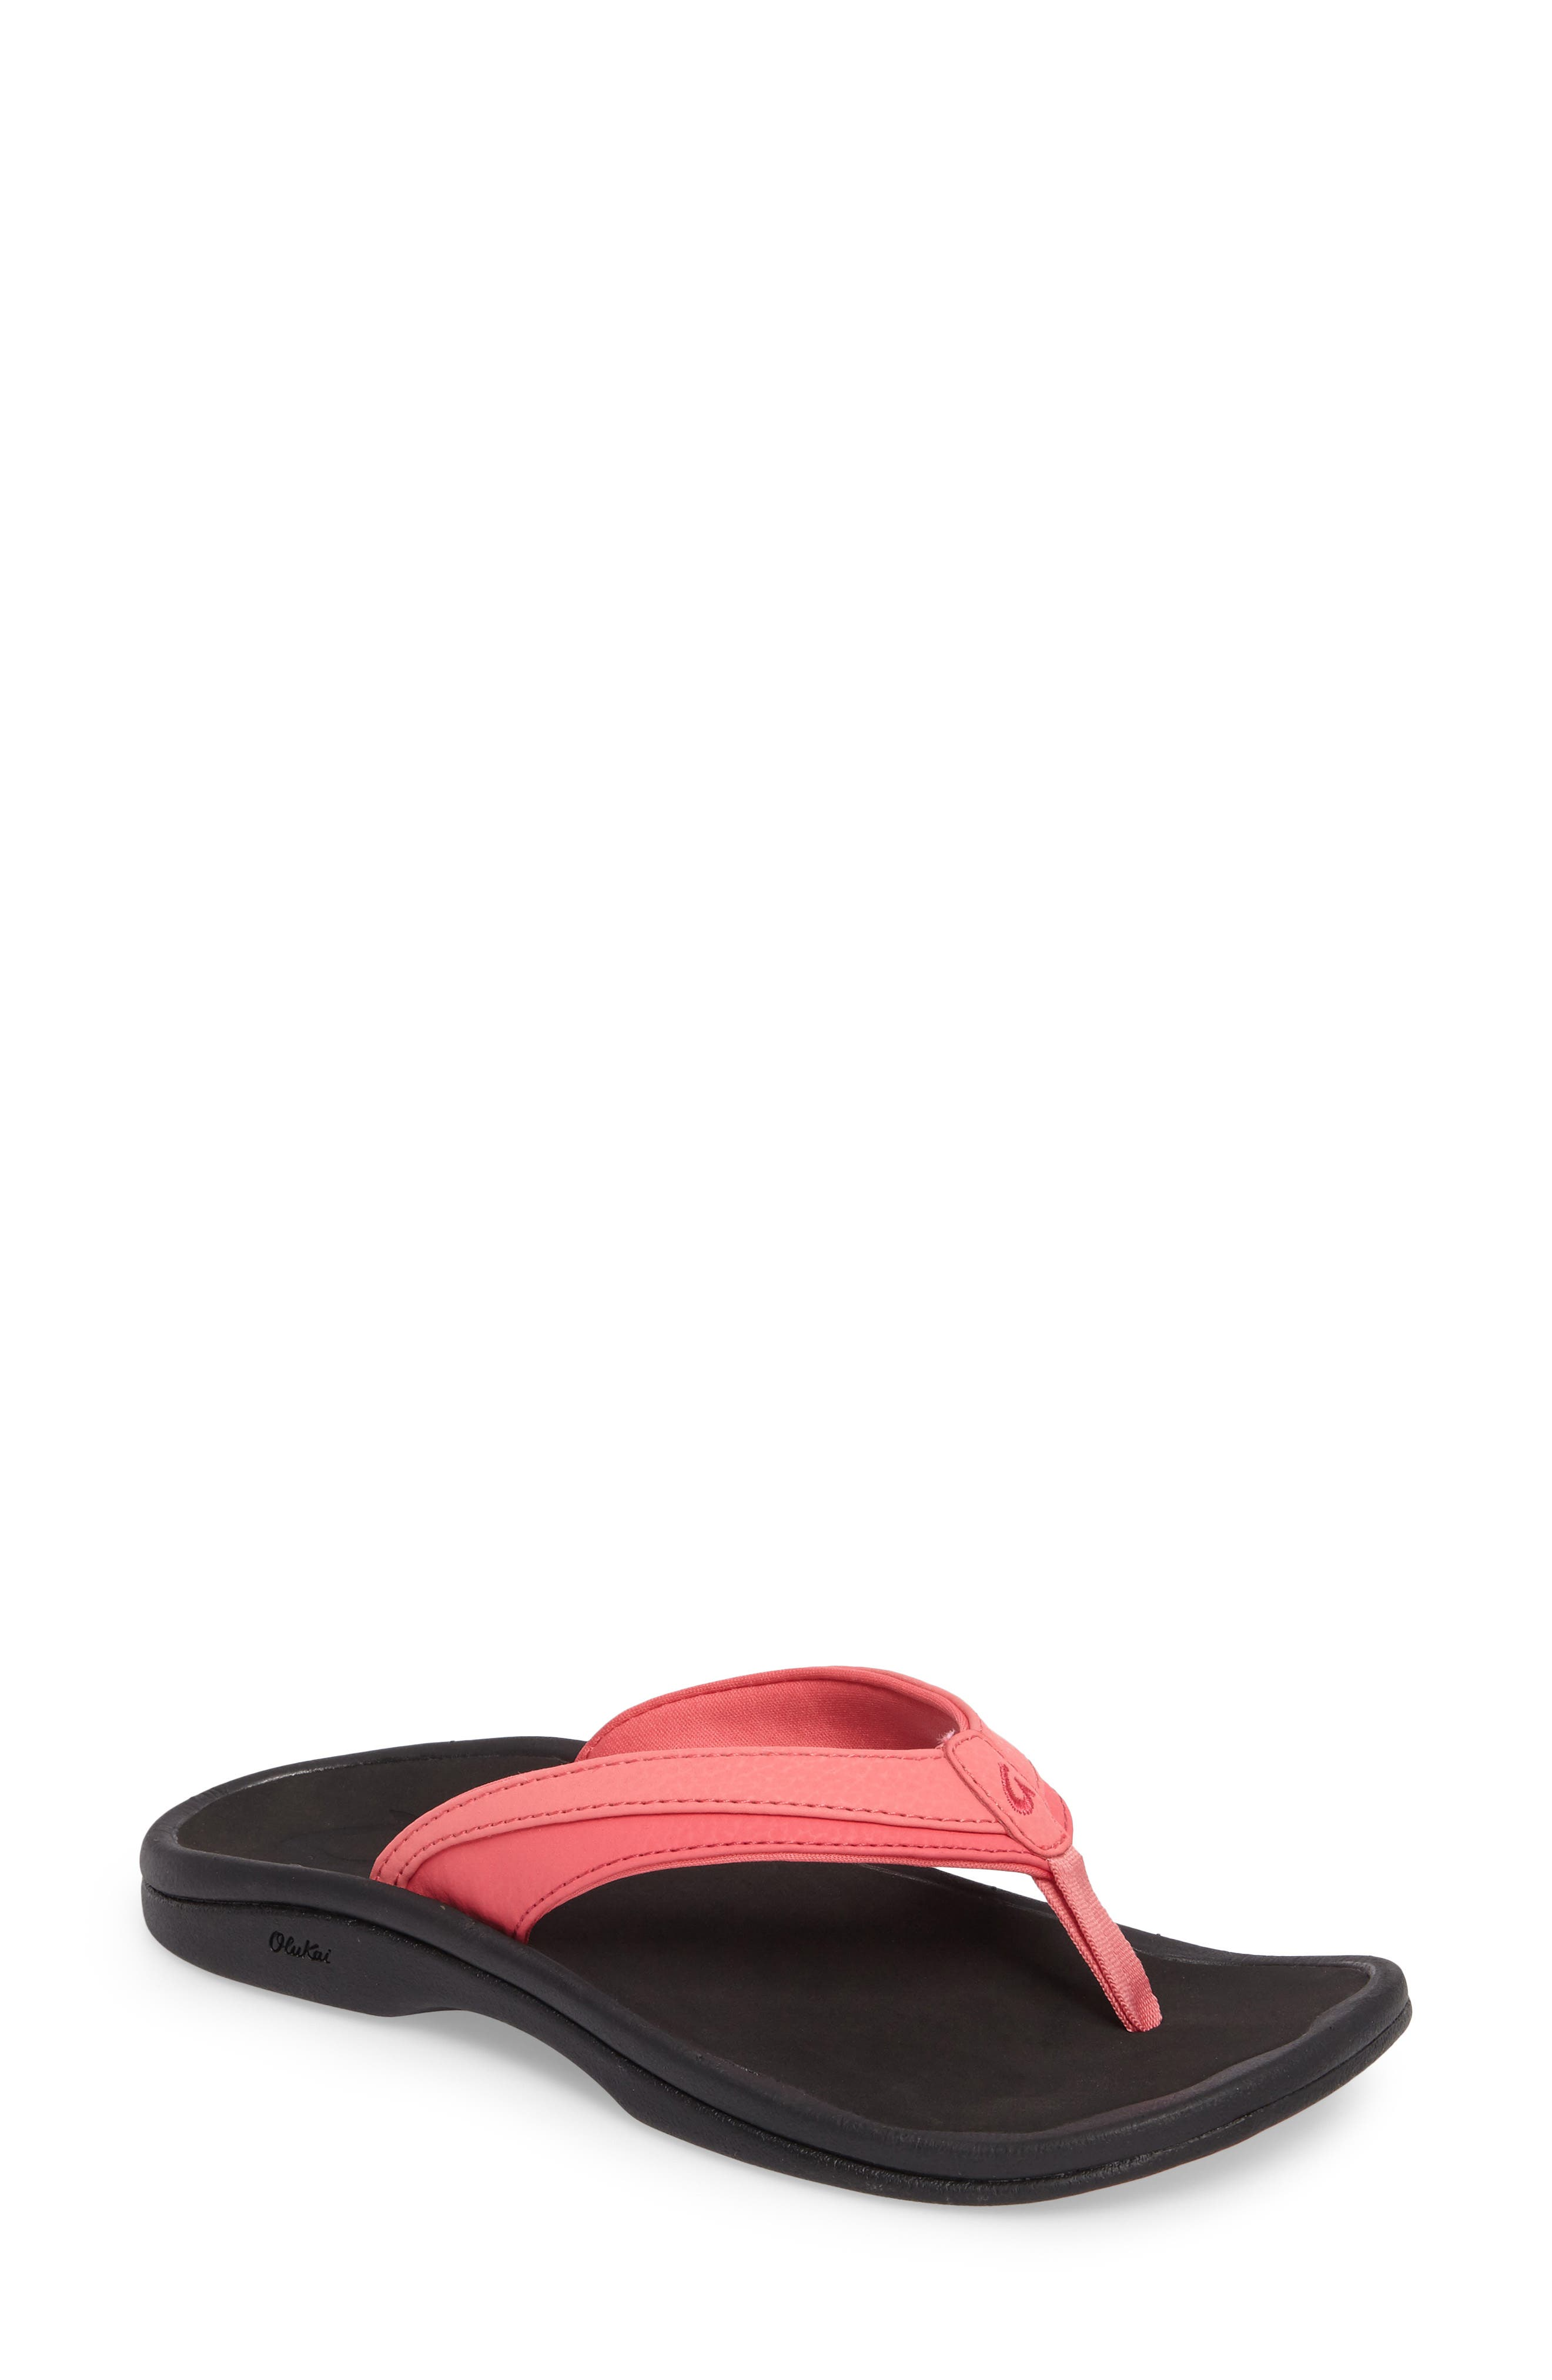 Ohana Sandal,                         Main,                         color, GUAVA JELLY/ BLACK FAUX